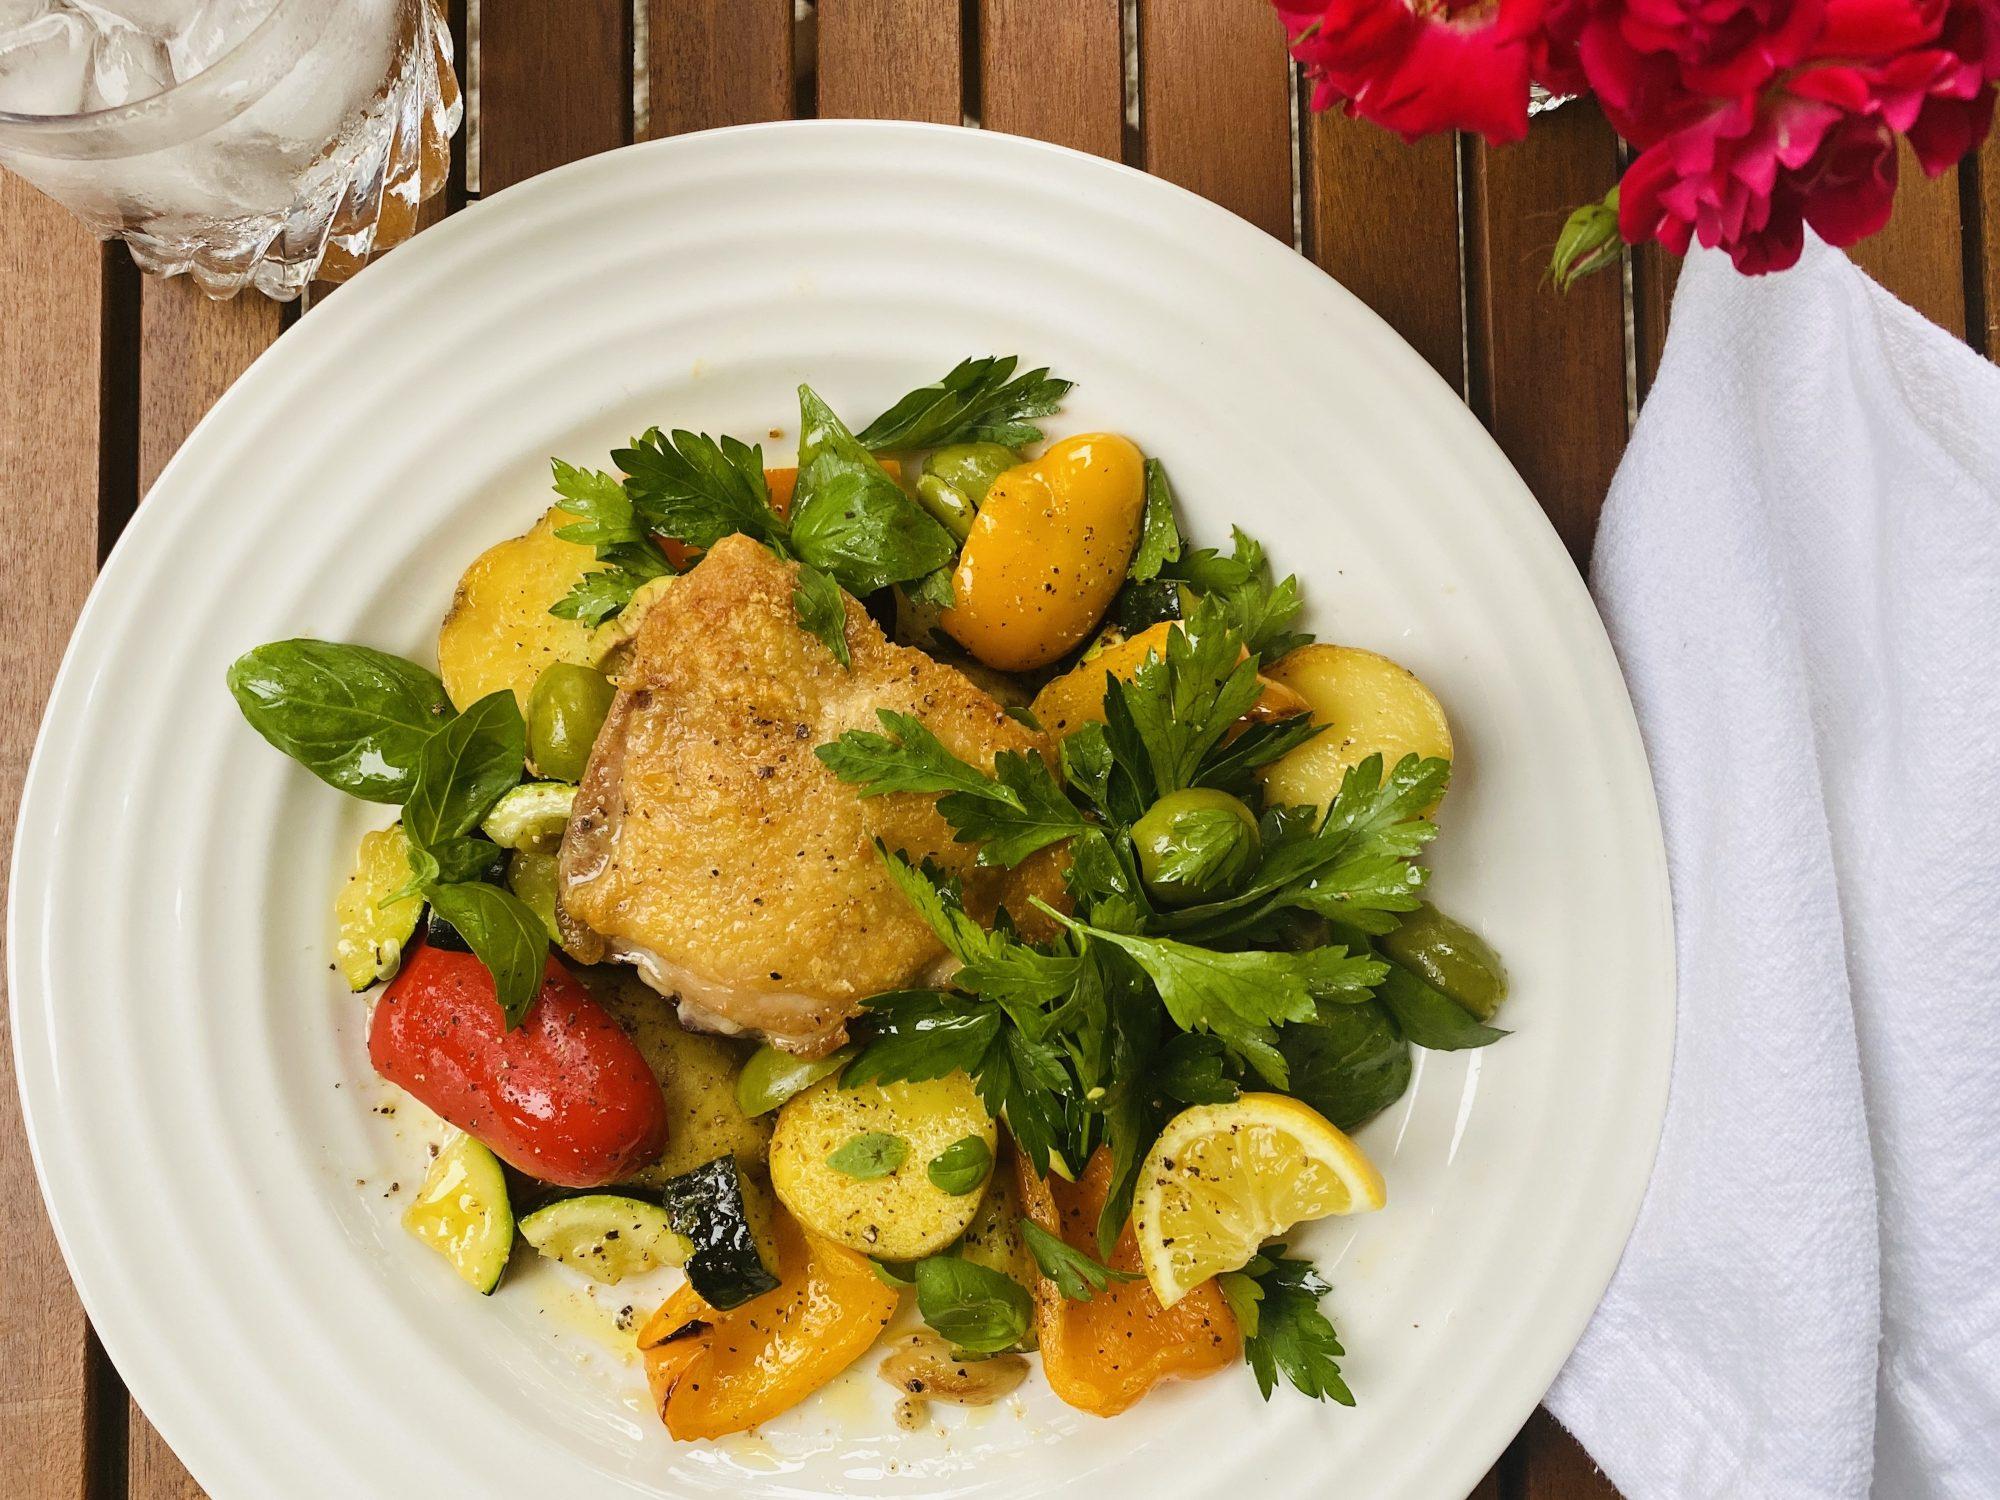 mr - Crispy Chicken Thighs With Summer Veggies Image